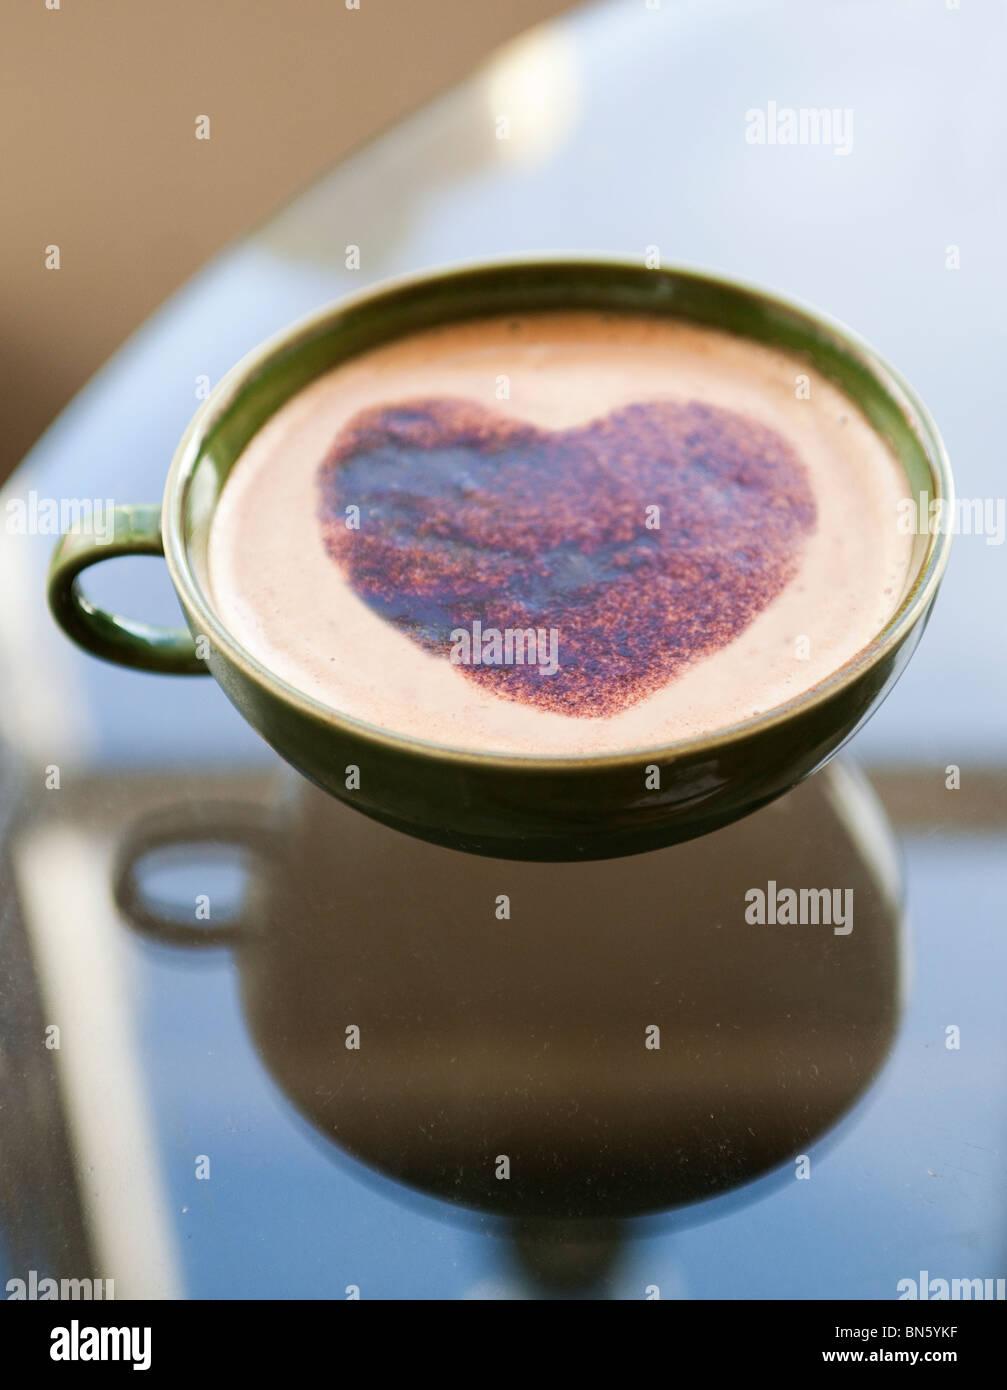 Corazon en taza de café Imagen De Stock